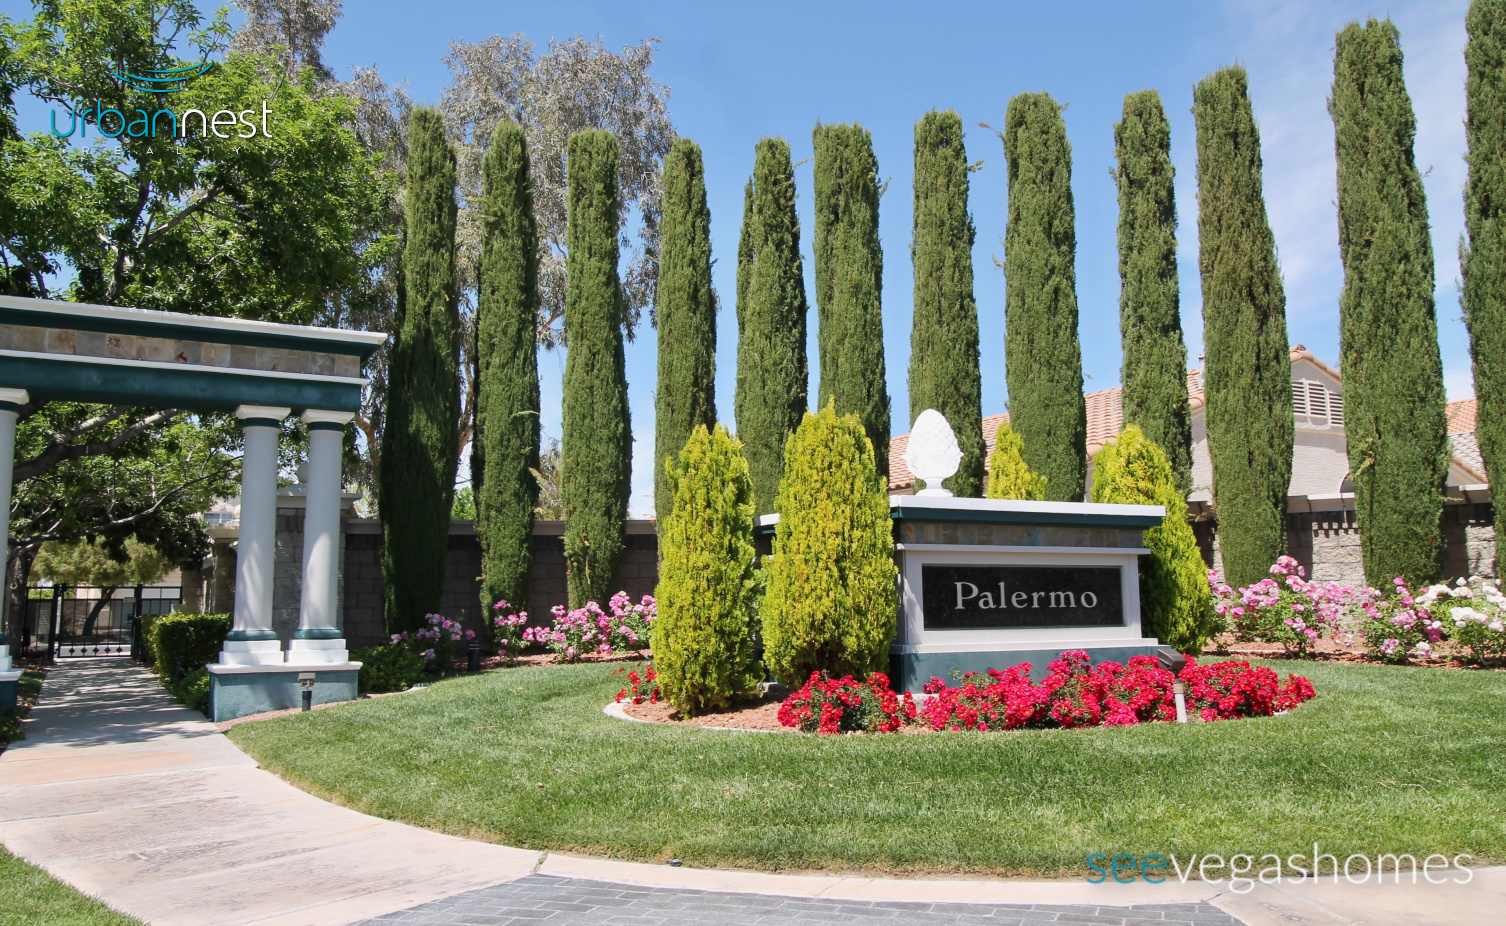 Palermo_Seven_Hills_Henderson_NV_89052_SeeVegasHomes